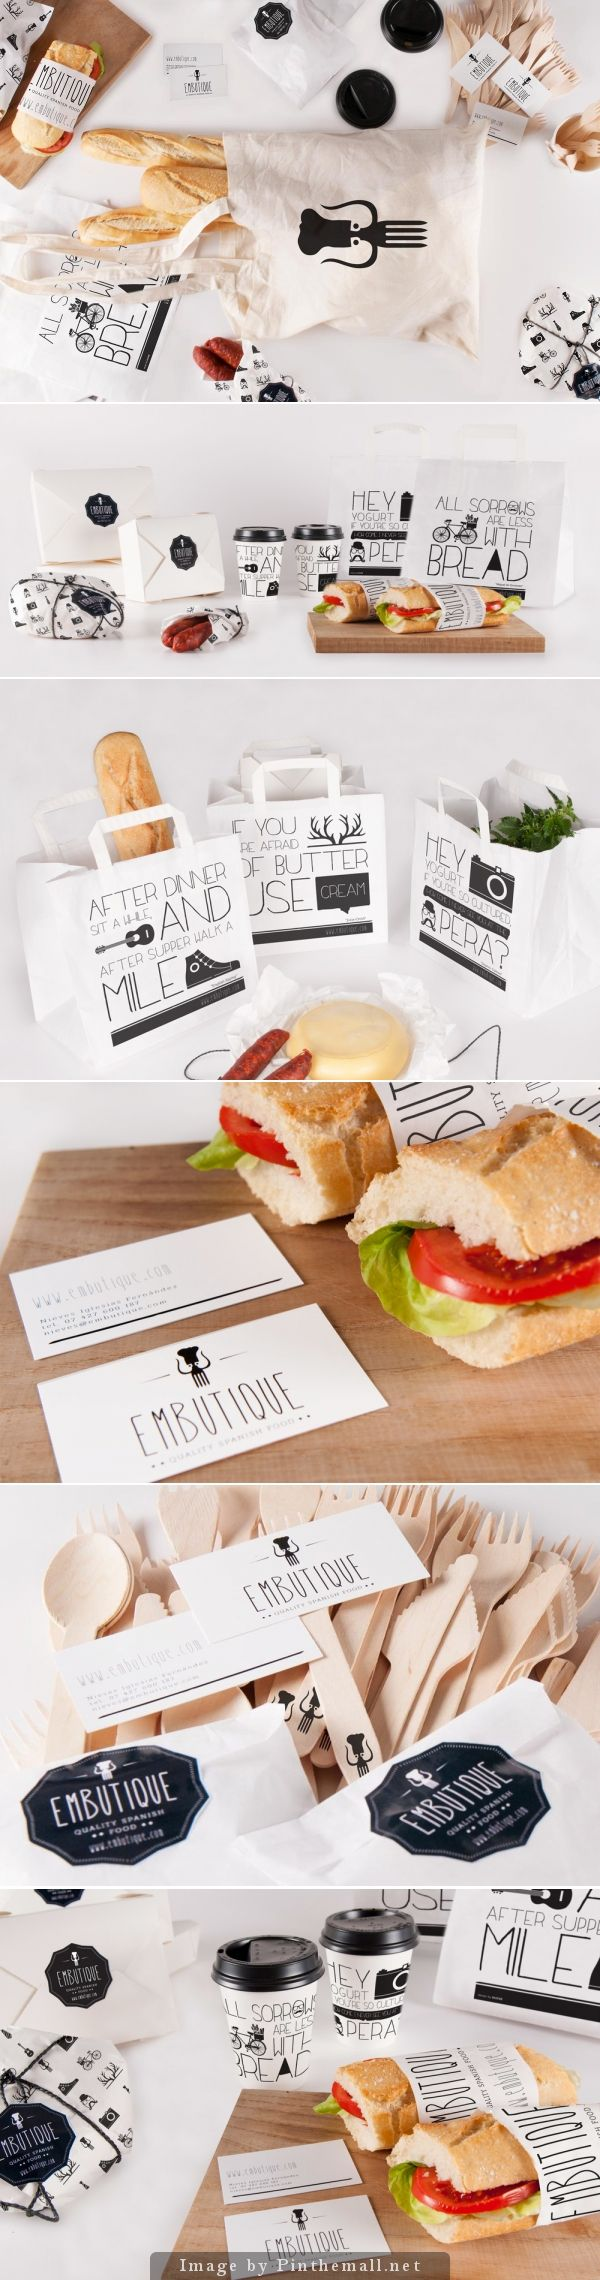 Embutique, great packaging design, sandwich, bread, innovative brand idea :: graphic design